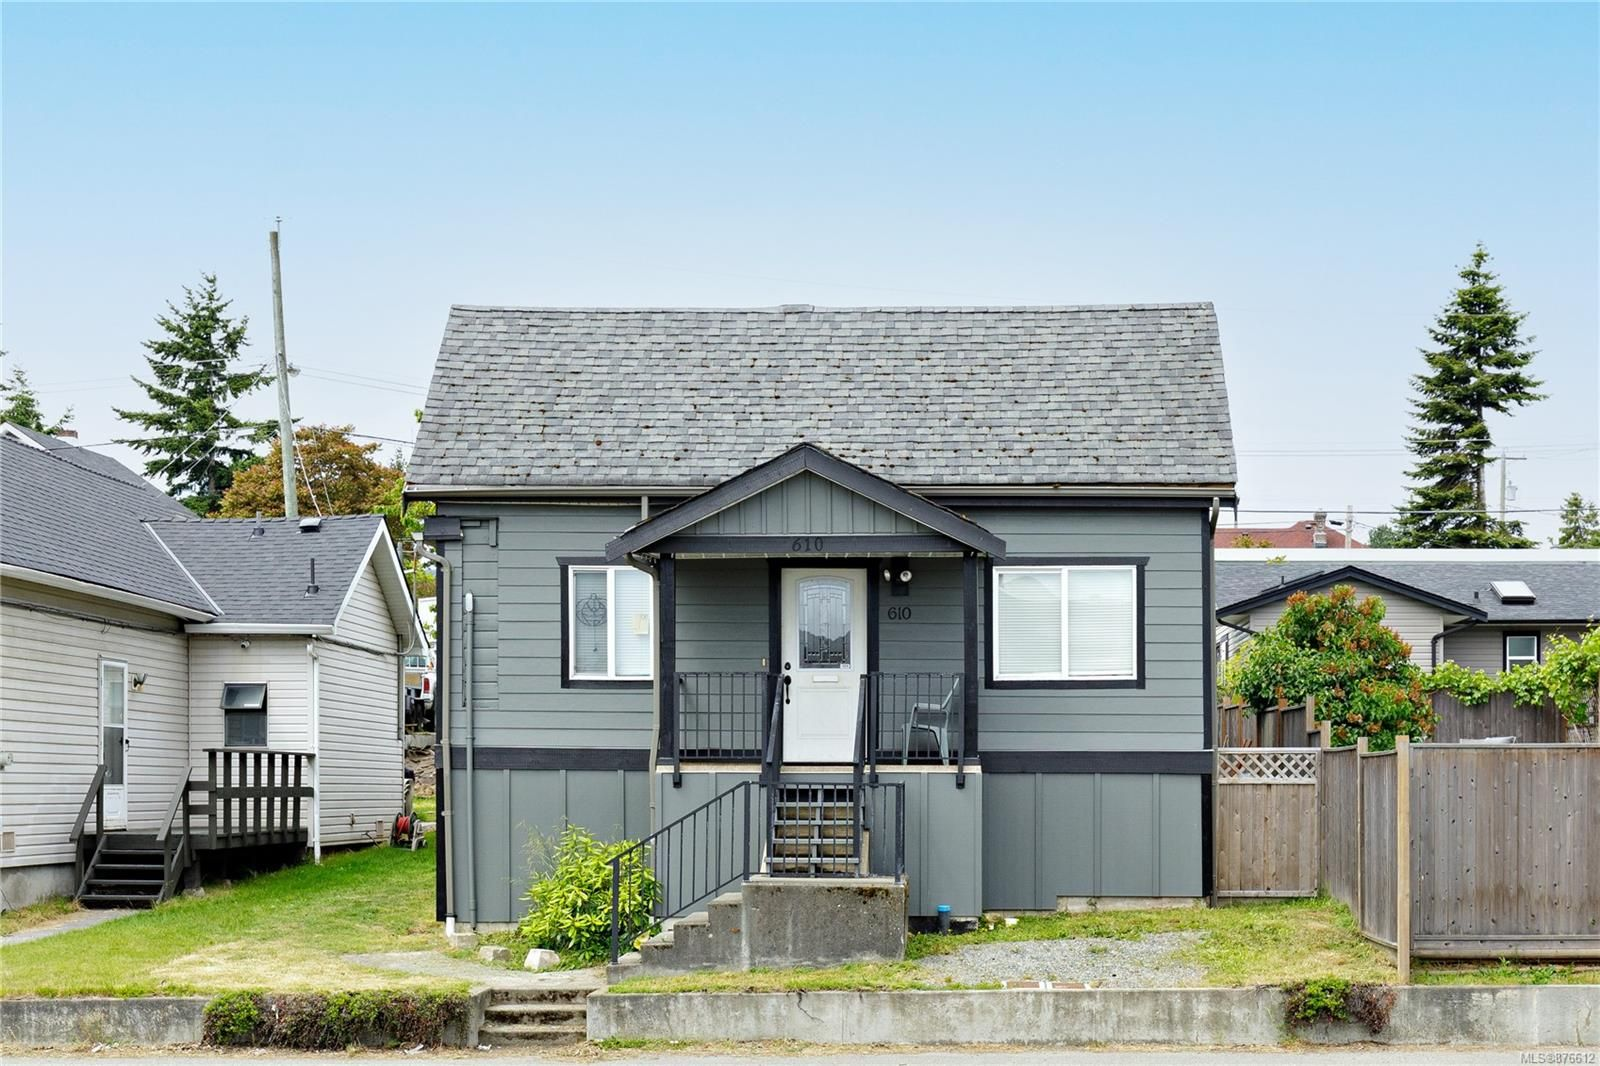 Main Photo: 610 Nicol St in : Na South Nanaimo House for sale (Nanaimo)  : MLS®# 876612